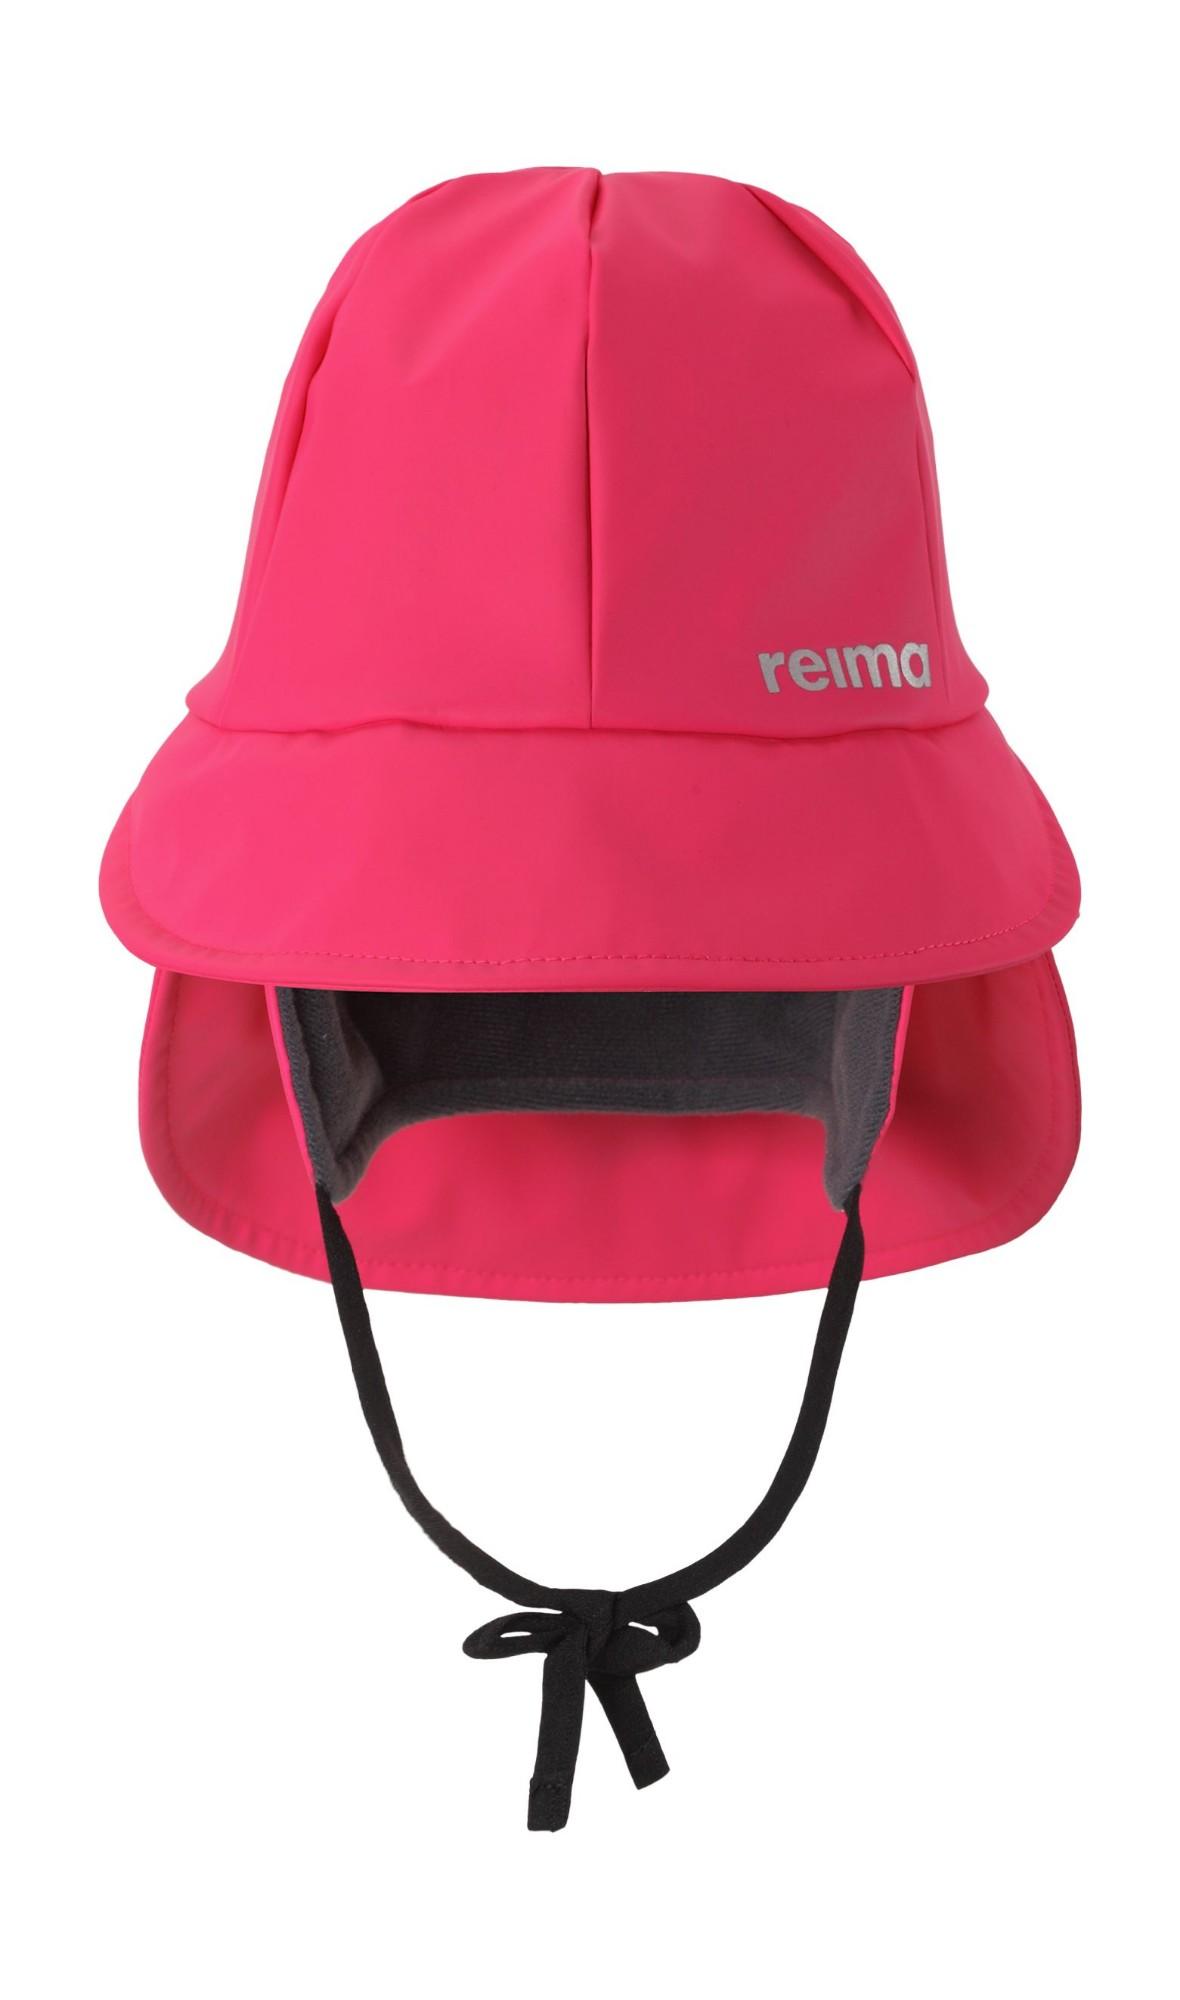 REIMA Rainy Candy Pink 52